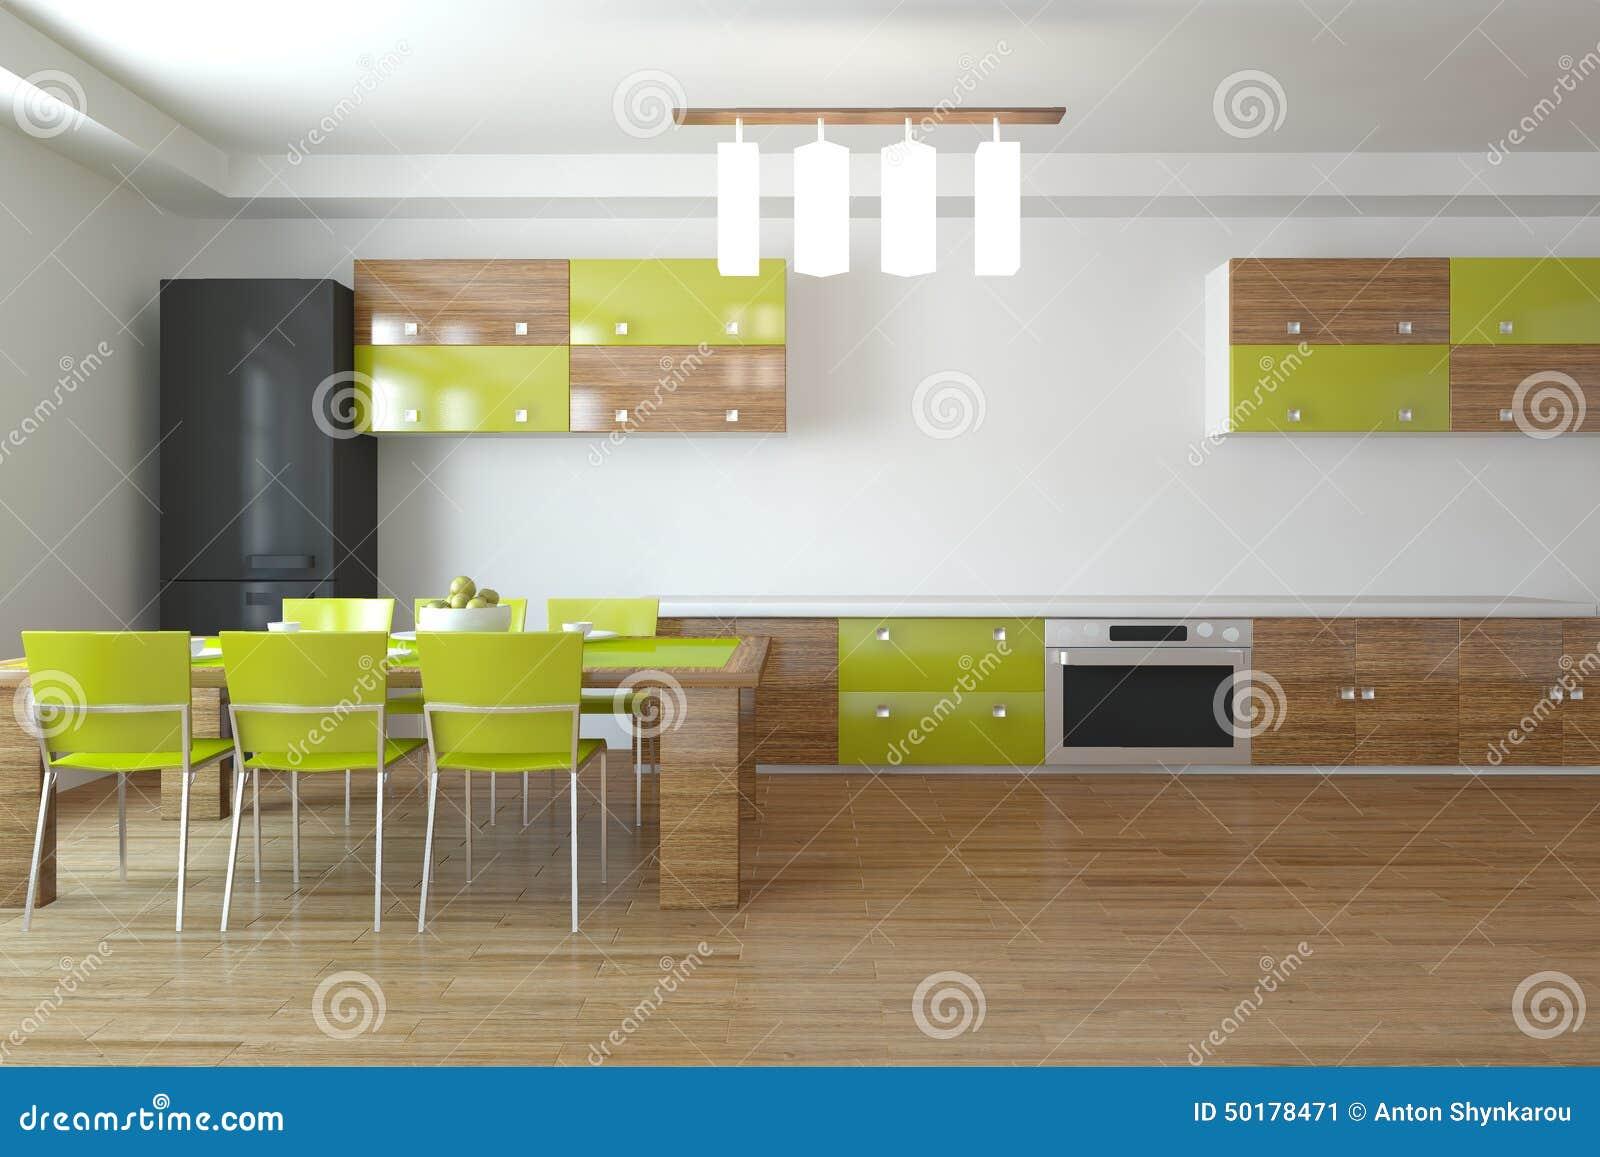 Zielony Kuchni Design 3d Rendering Ilustracji Ilustracja